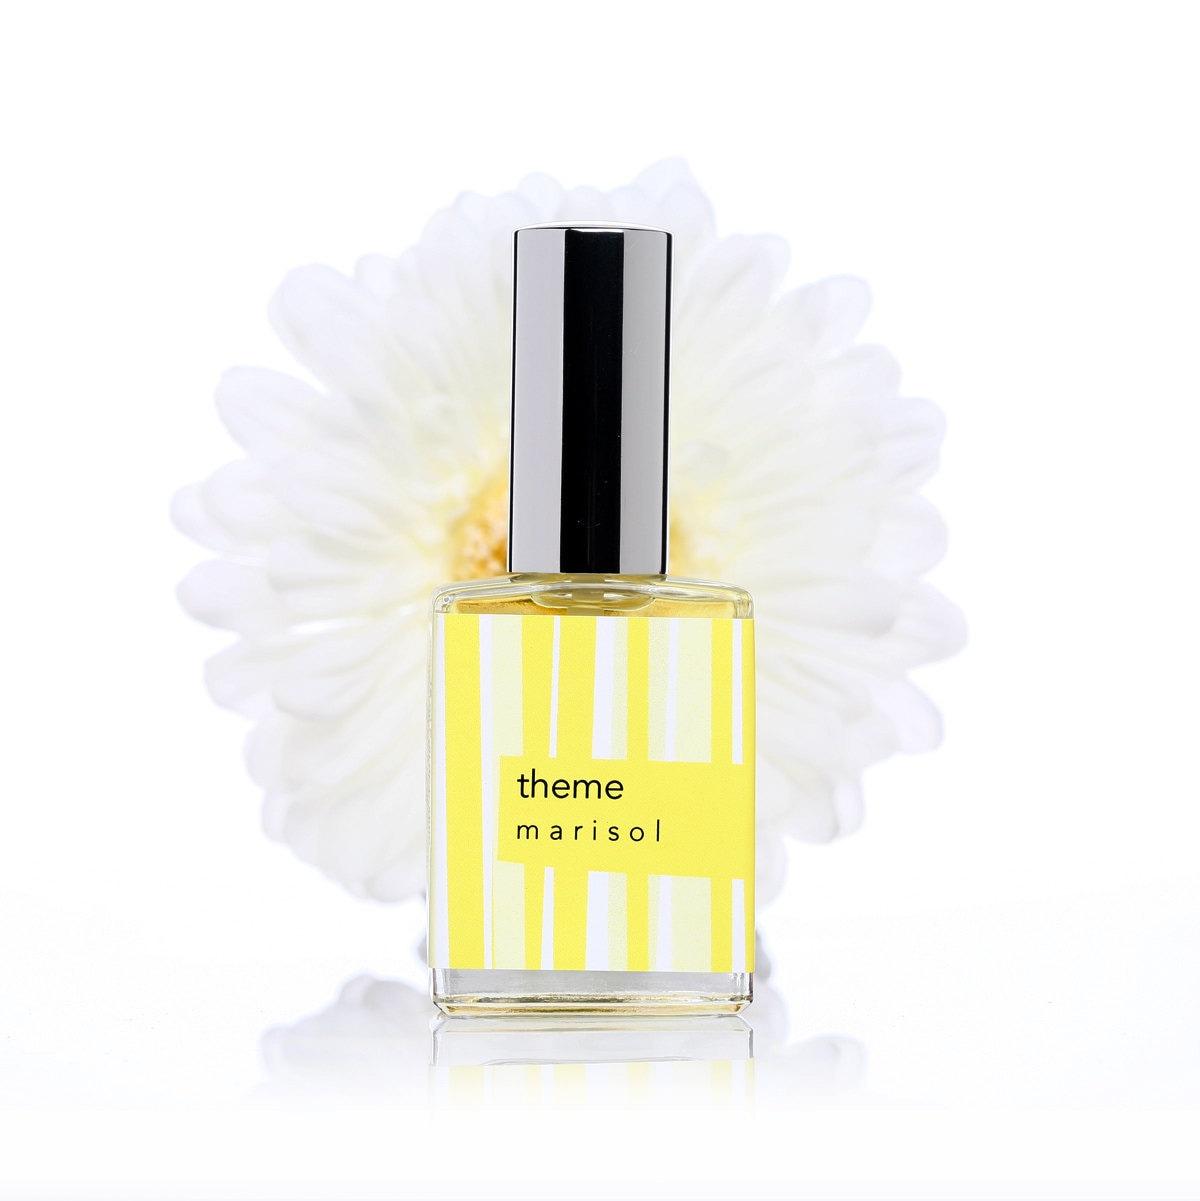 Fragrance Orange Blossom Perfume: Items Similar To Neroli Perfume. Marisol Perfume. Orange Blossom. Citrus Perfume, Bright Perfume